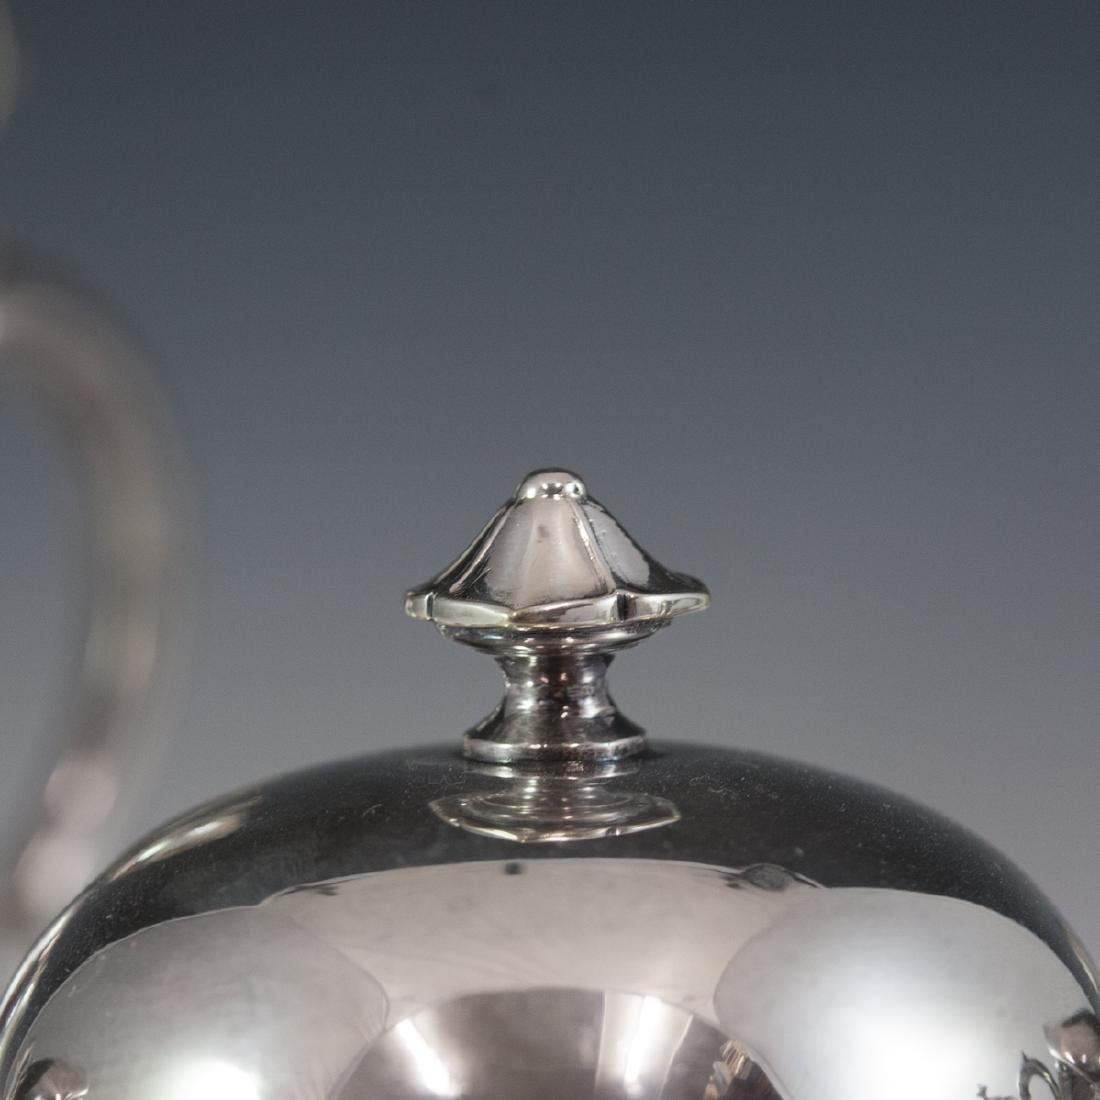 Antique Christofle Silverplated Tea Set - 5